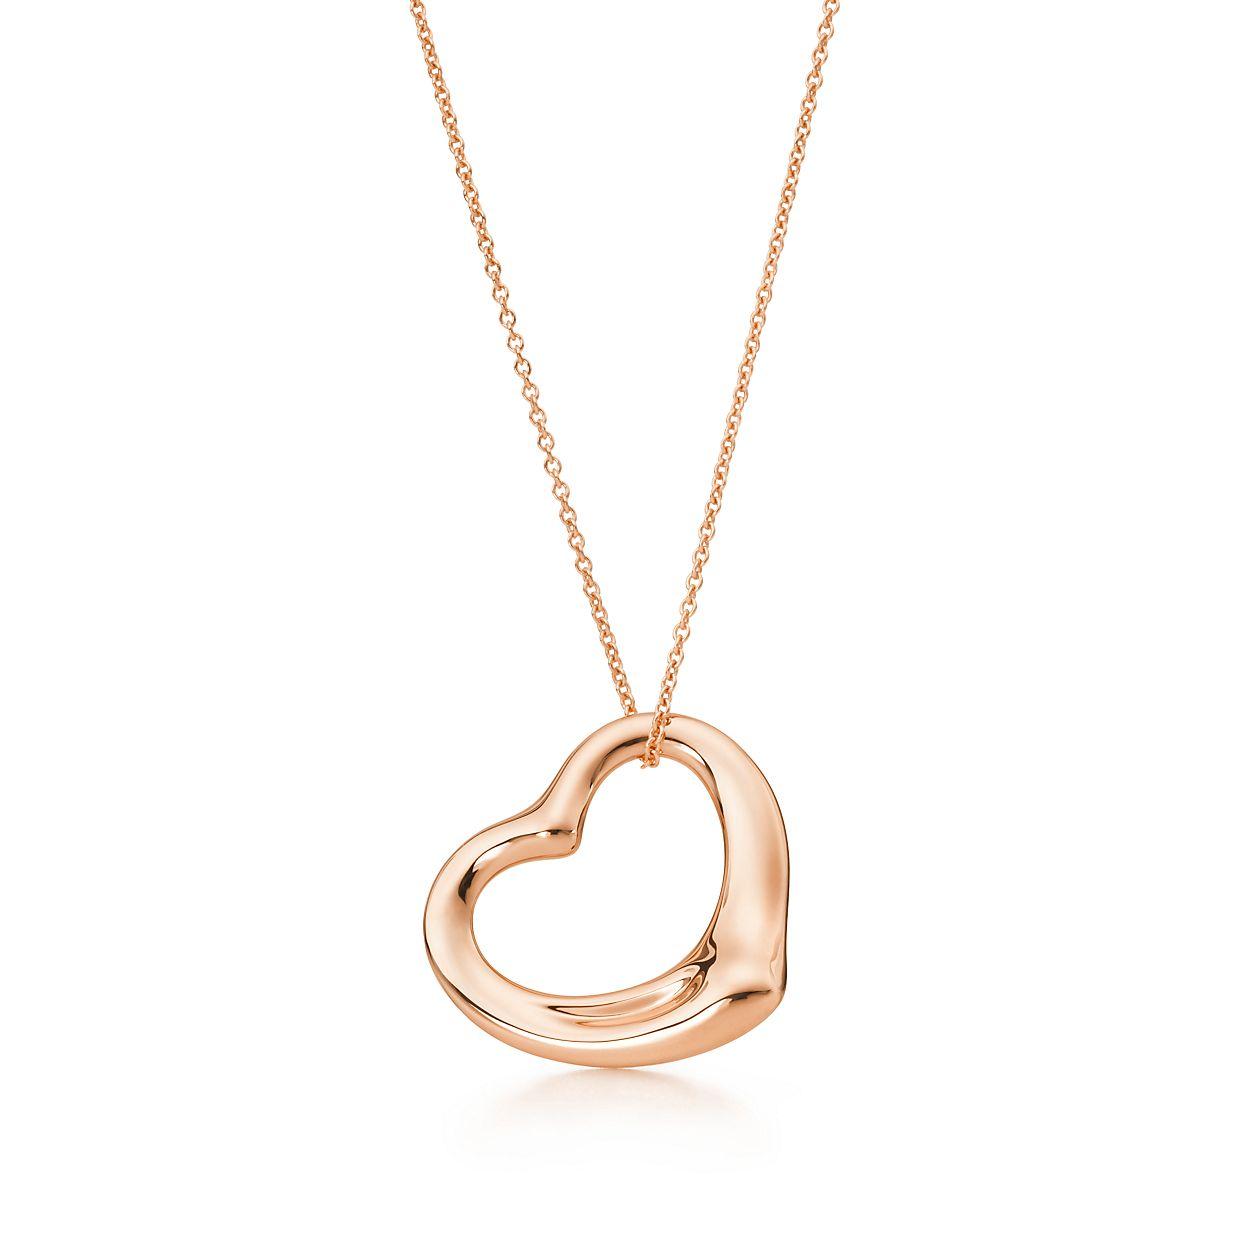 Elsa peretti open heart pendant in 18k rose gold 22 mm elsa perettiopen heart pendant aloadofball Gallery